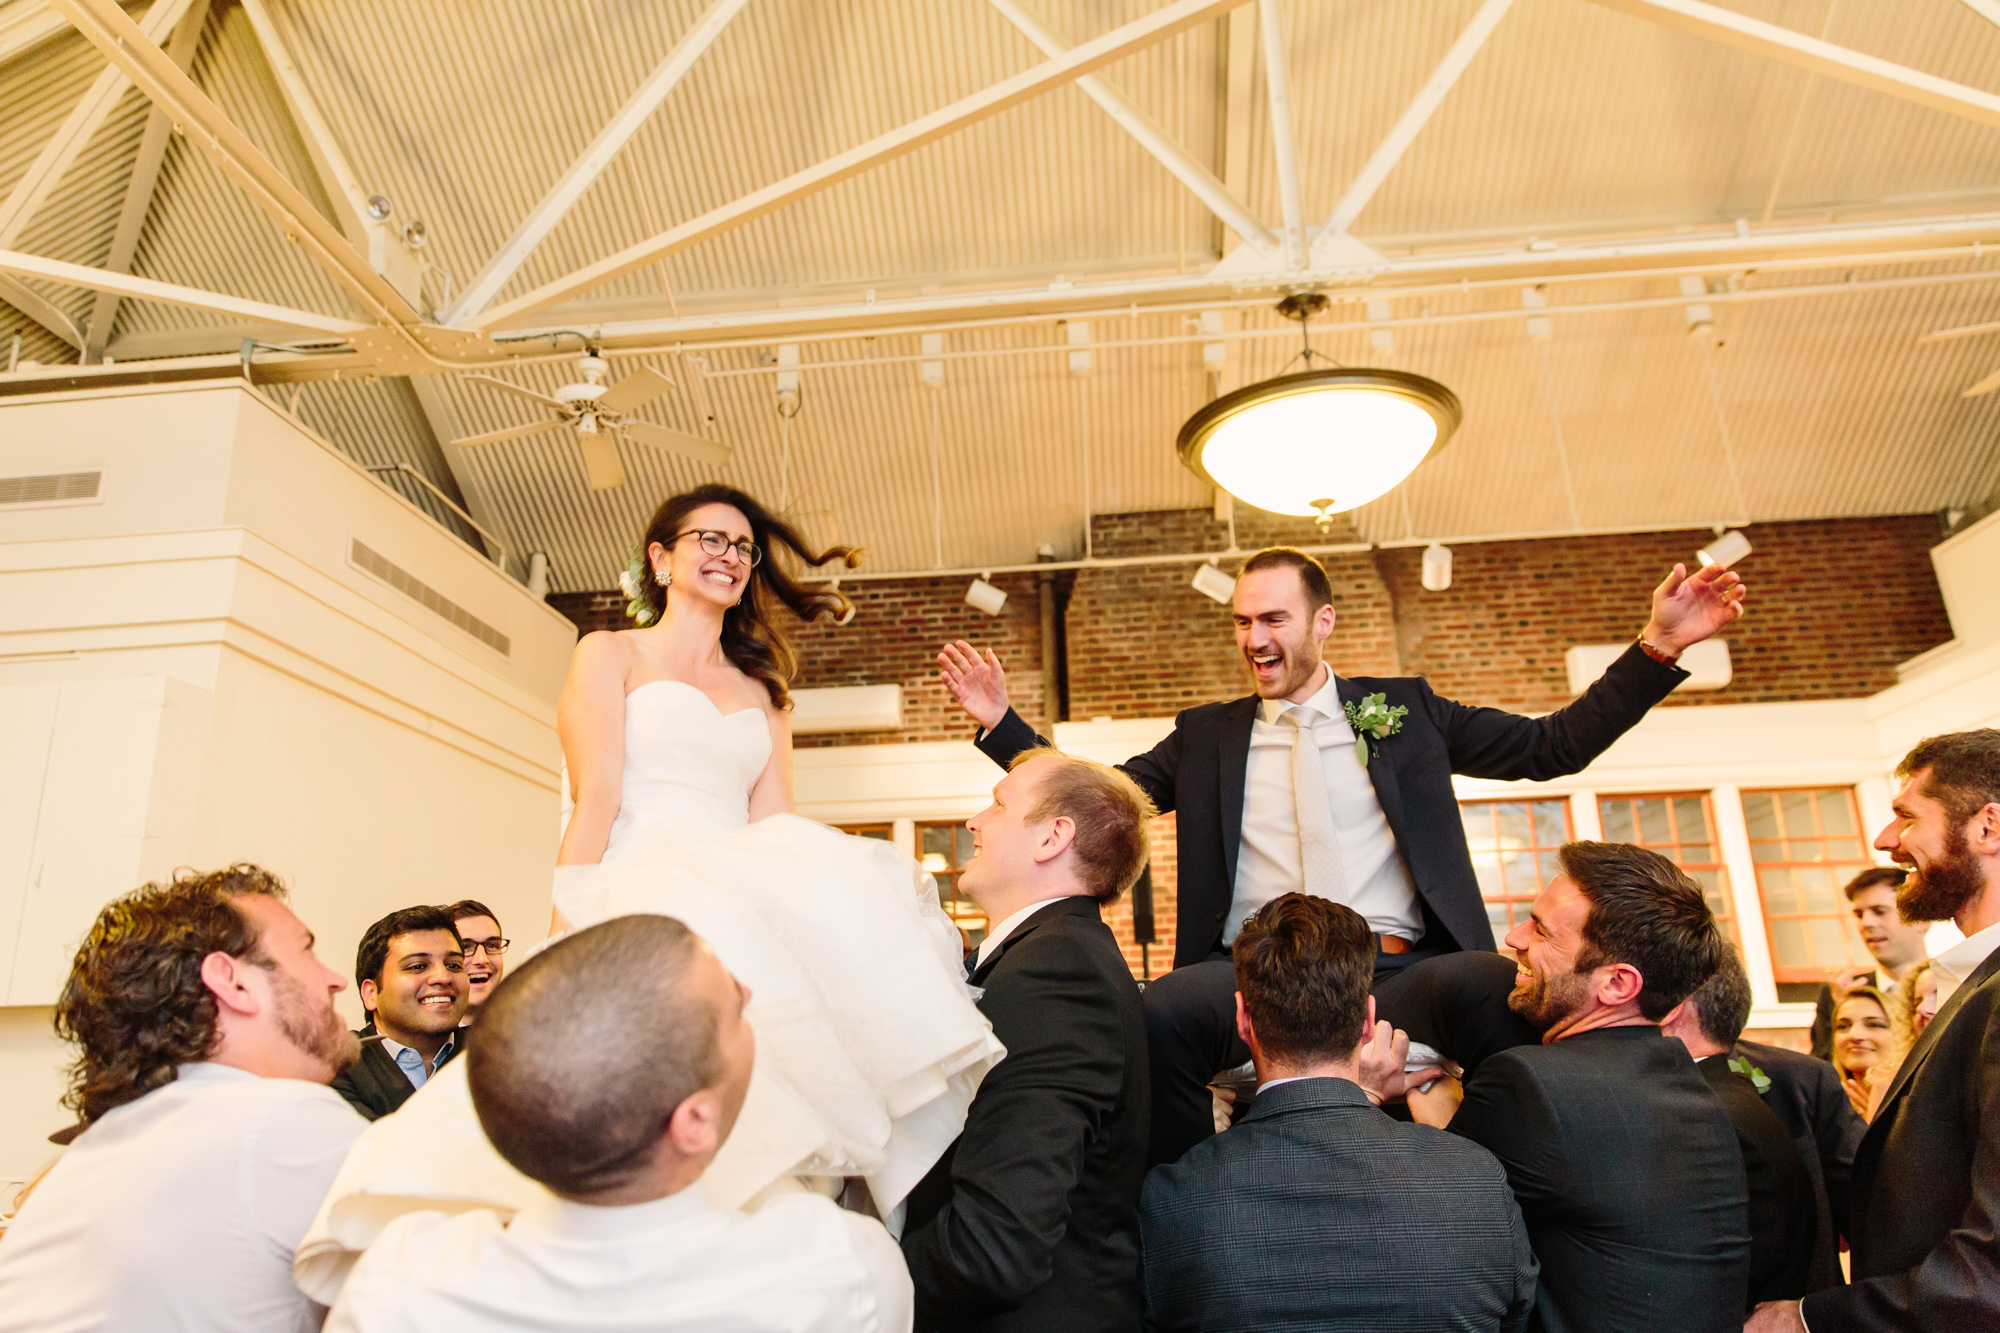 42_Kate_Sam_Picnic_House_Wedding_Brooklyn_NY_Tanya_Salazar_Photography_921.jpg